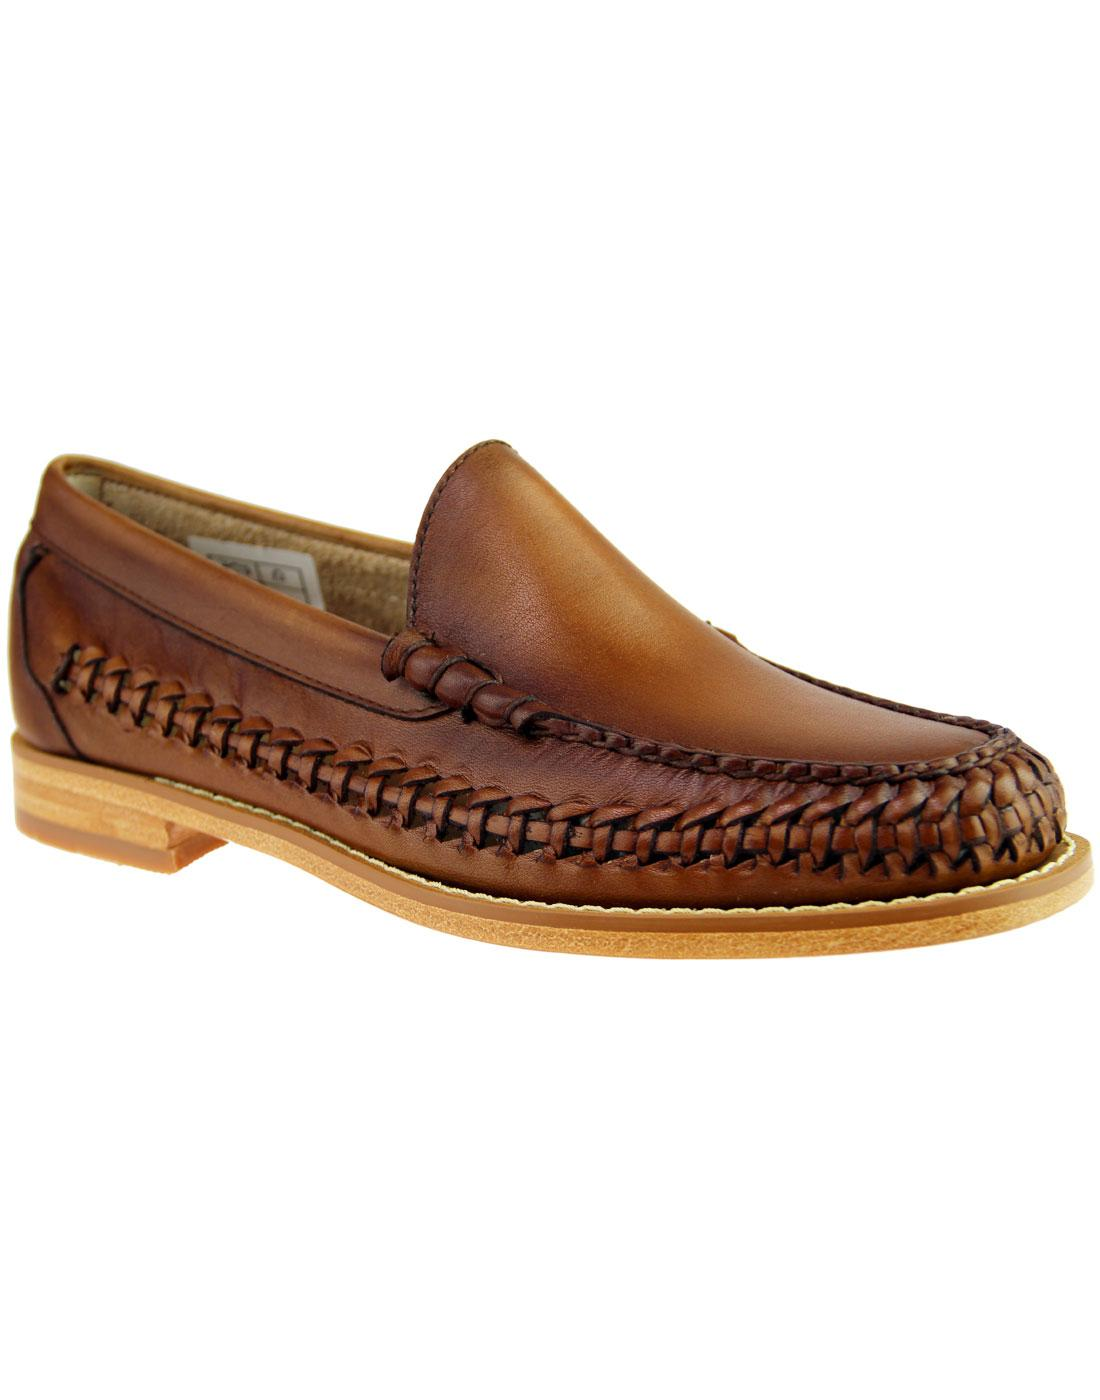 BASS WEEJUNS Venetian Weave Retro Mod Loafers TAN